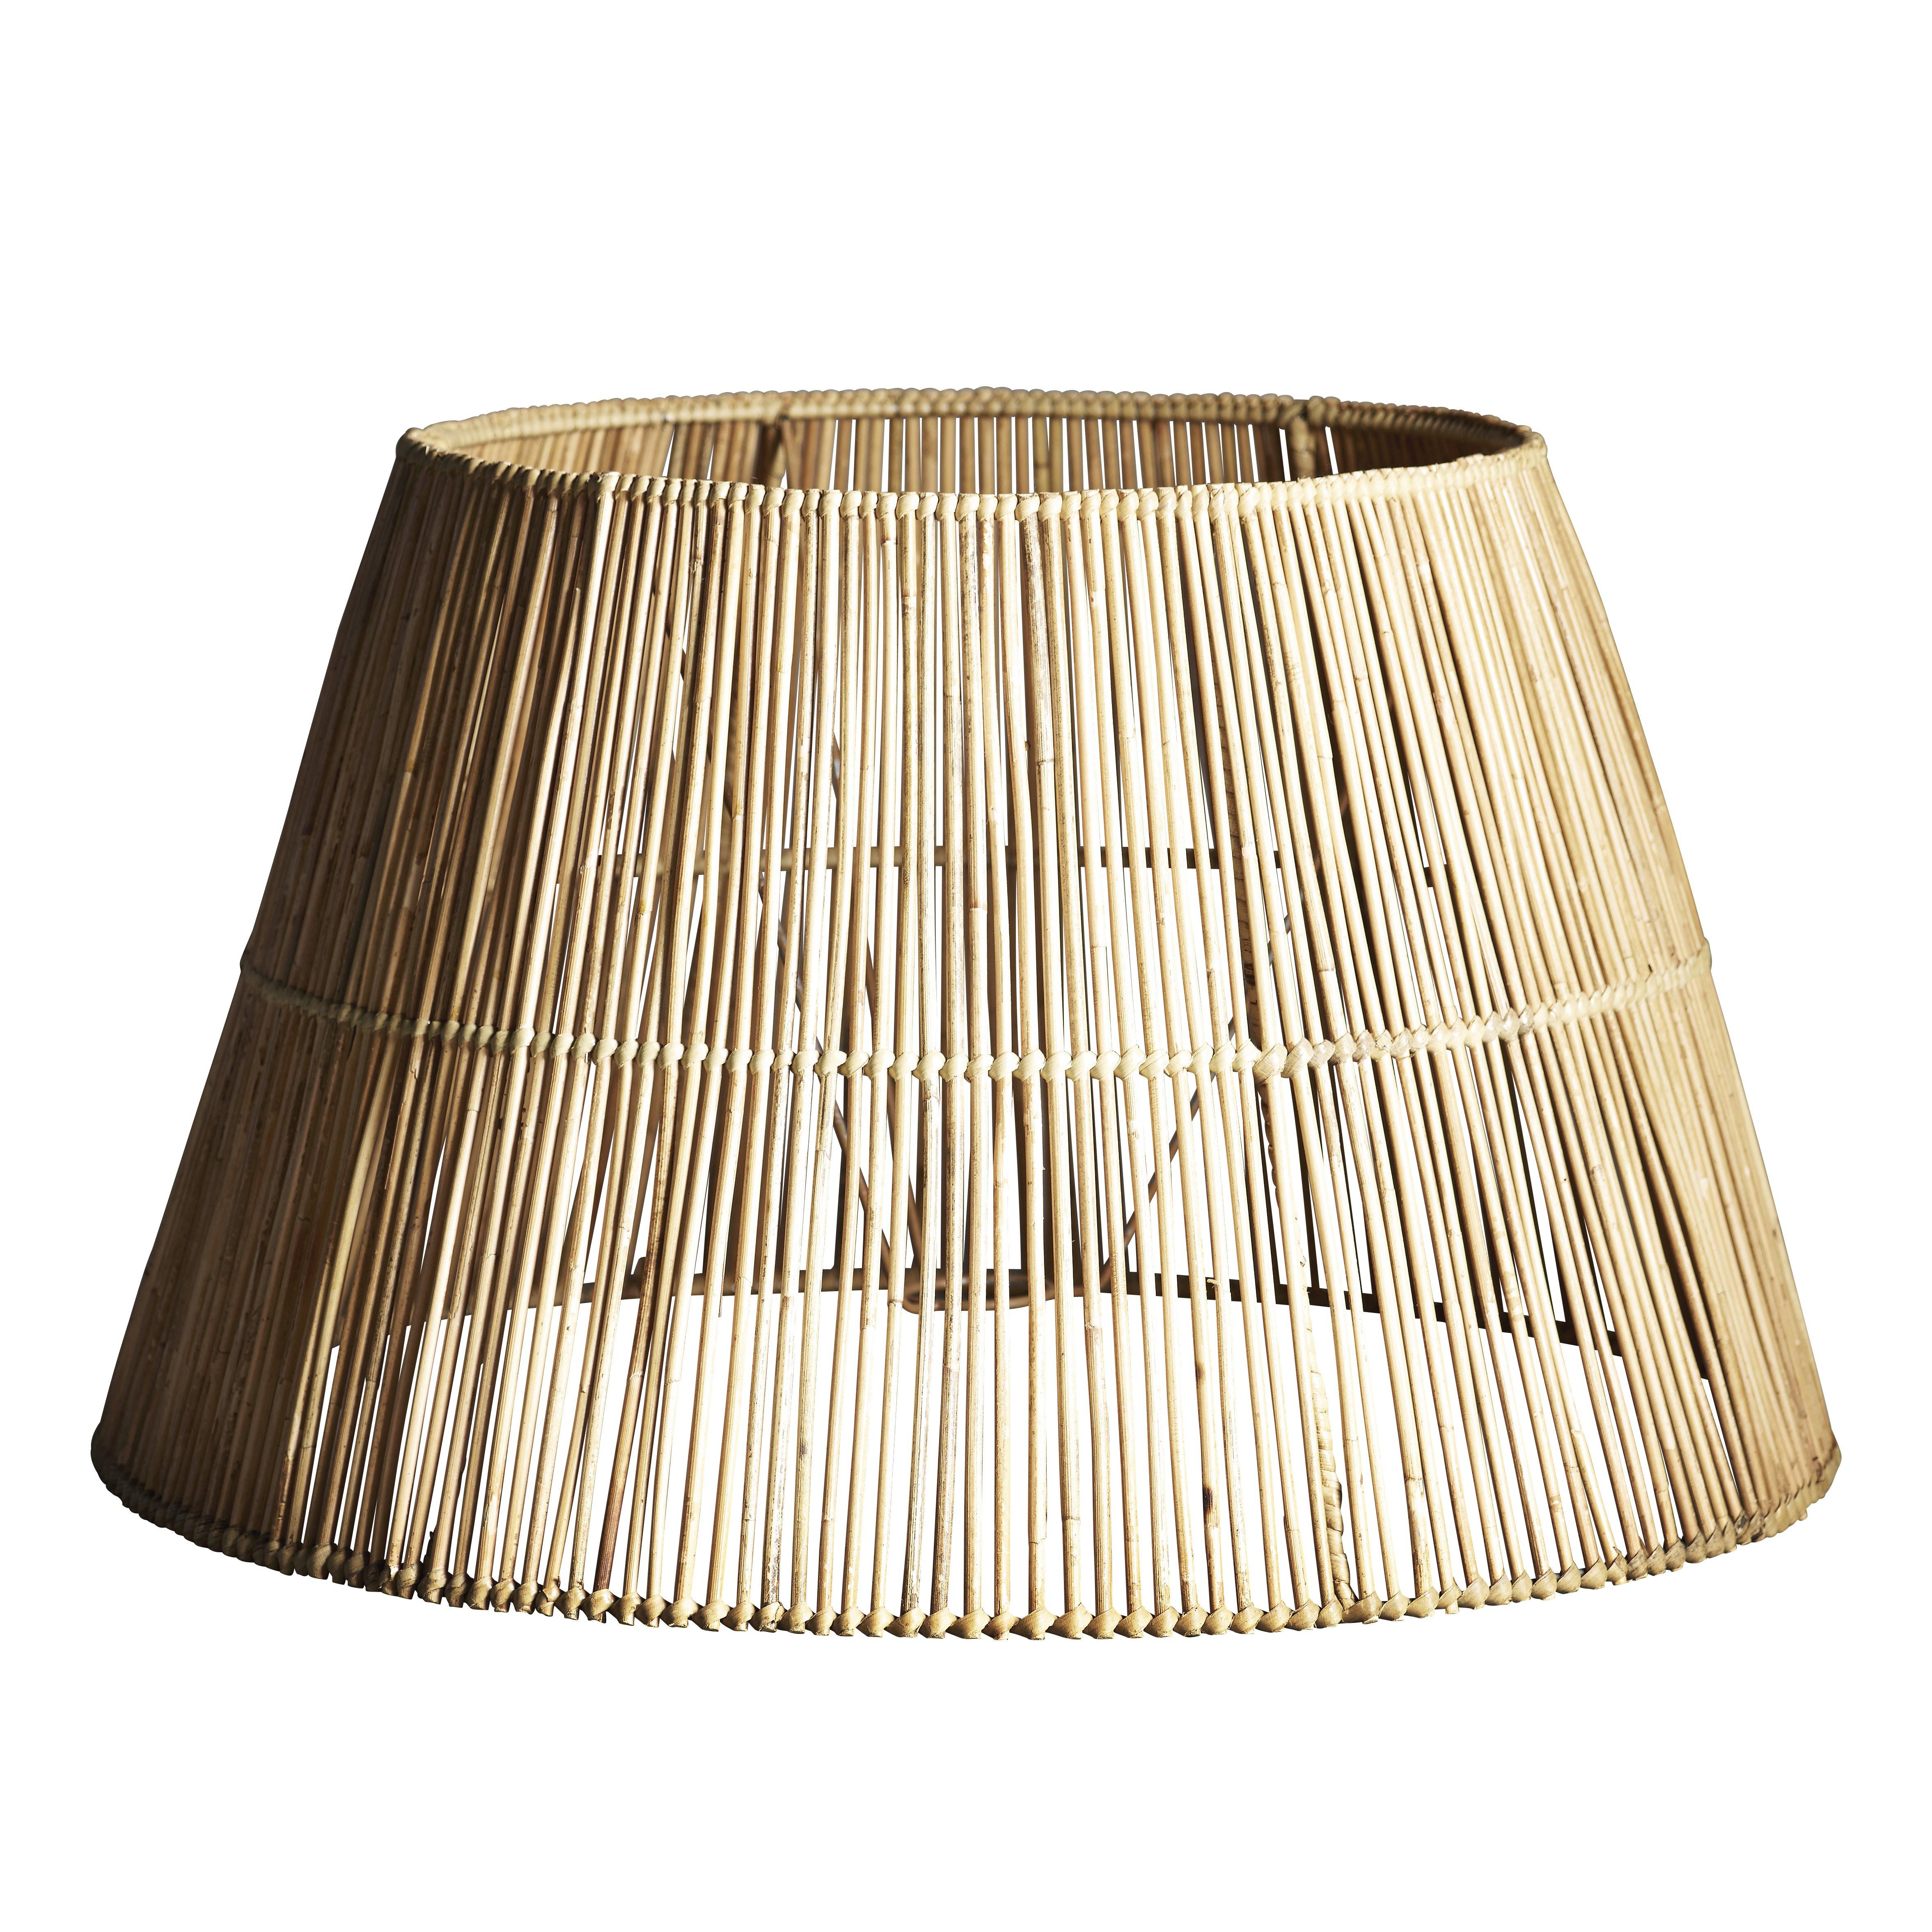 rattan floor vase of 15 fresh pretty floor lamps wonderfull lighting world with regard to pretty floor lamps luxury lampshade in rattan xl products of 15 fresh pretty floor lamps